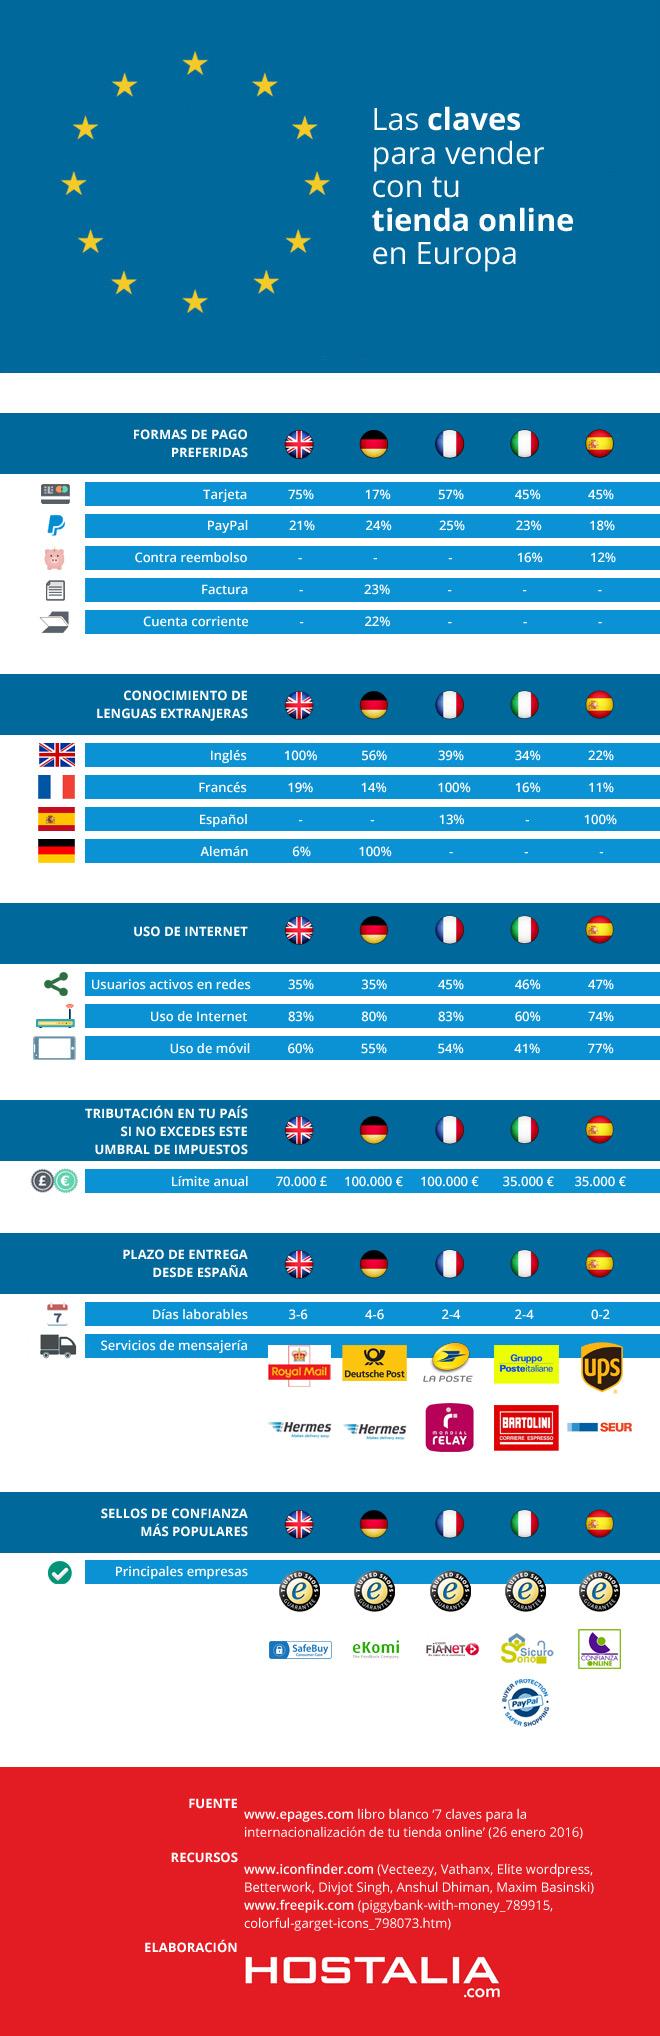 infografia-claves-vender-tienda-online-europa